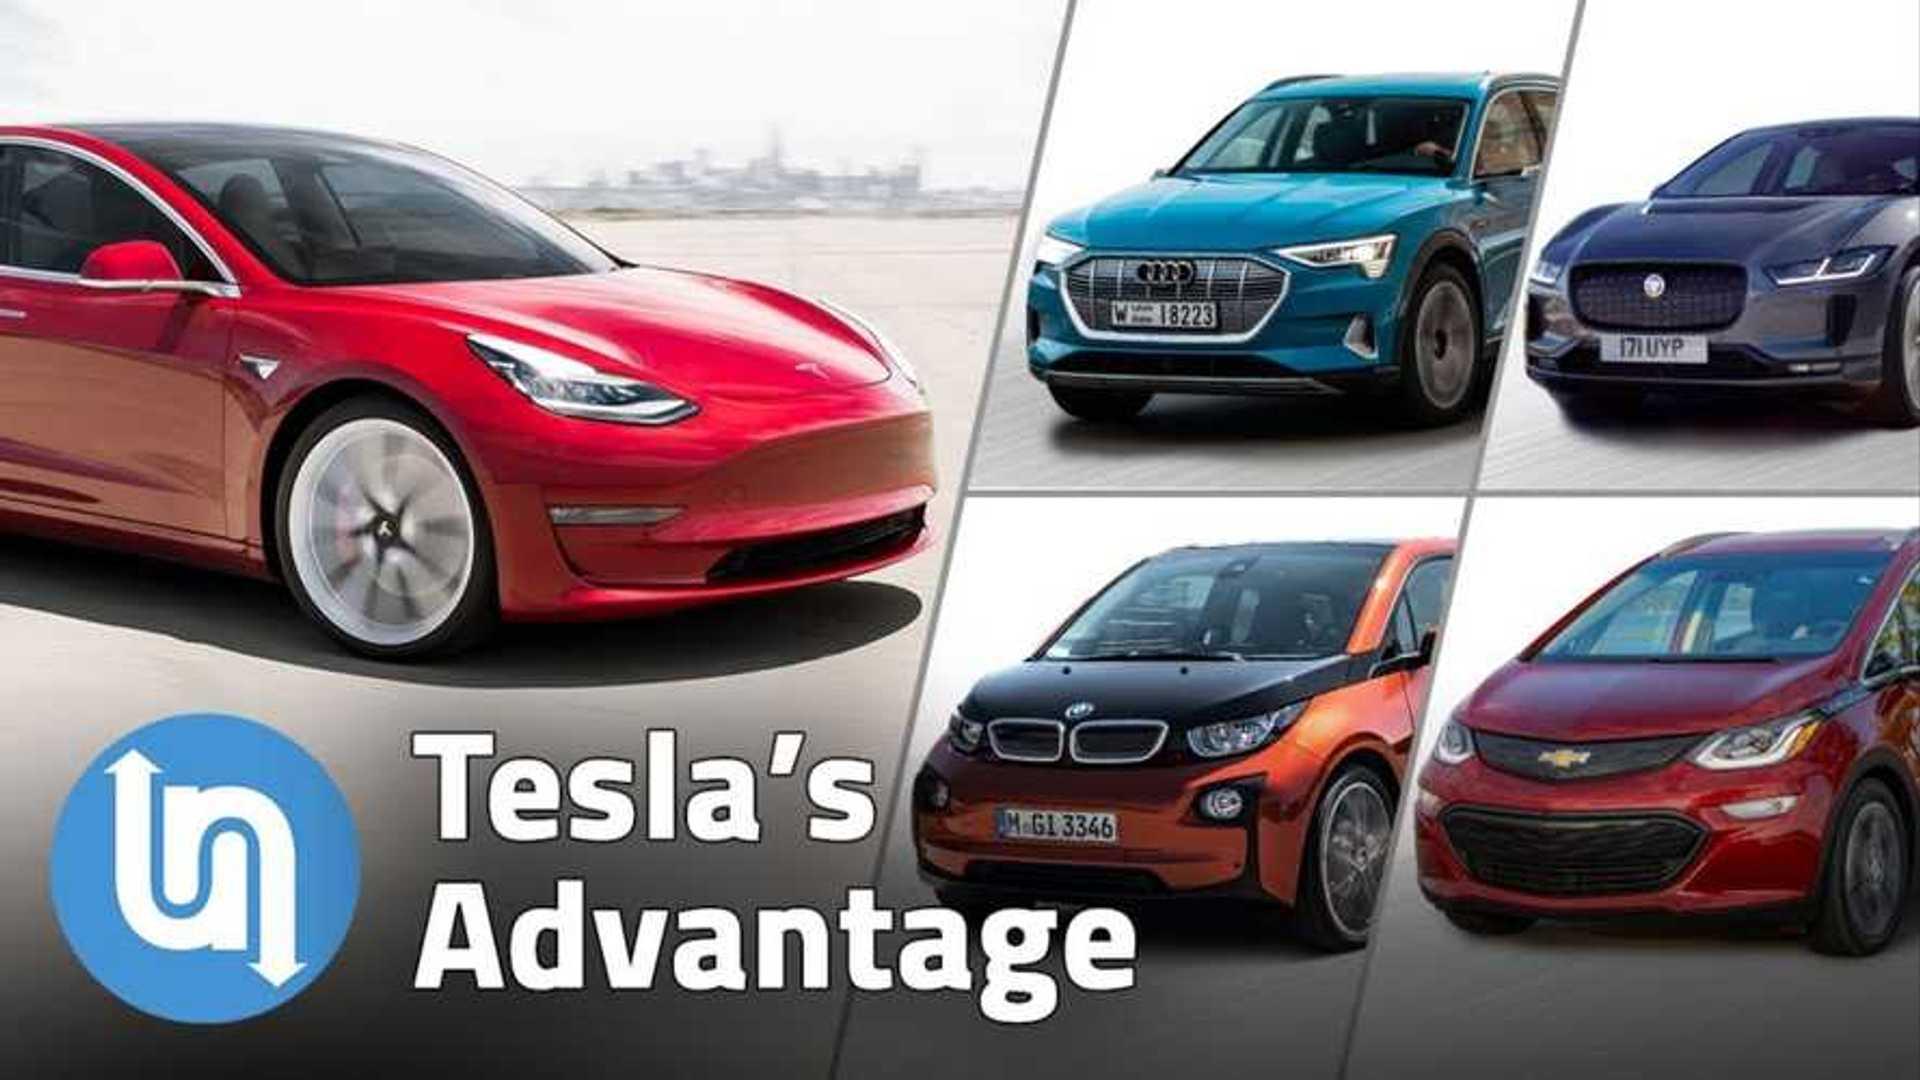 Tesla Vs Competitors: 5 Key Advantages In Tesla's Favor